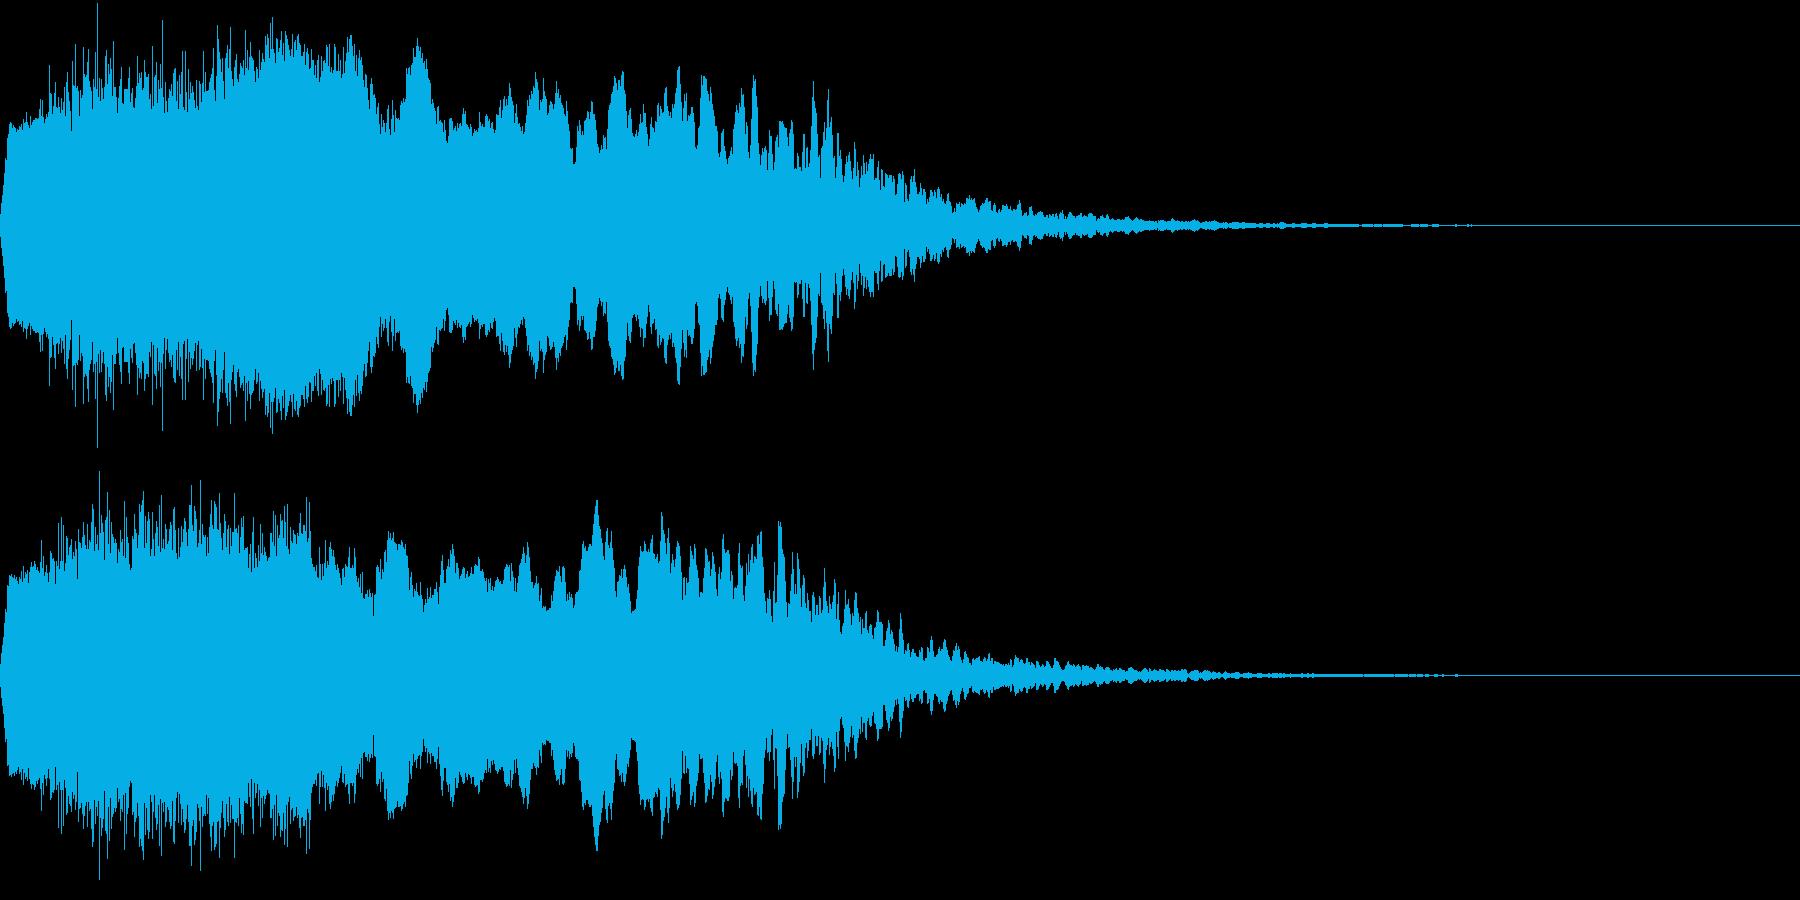 Riser アゲアゲ系 上昇音 1の再生済みの波形